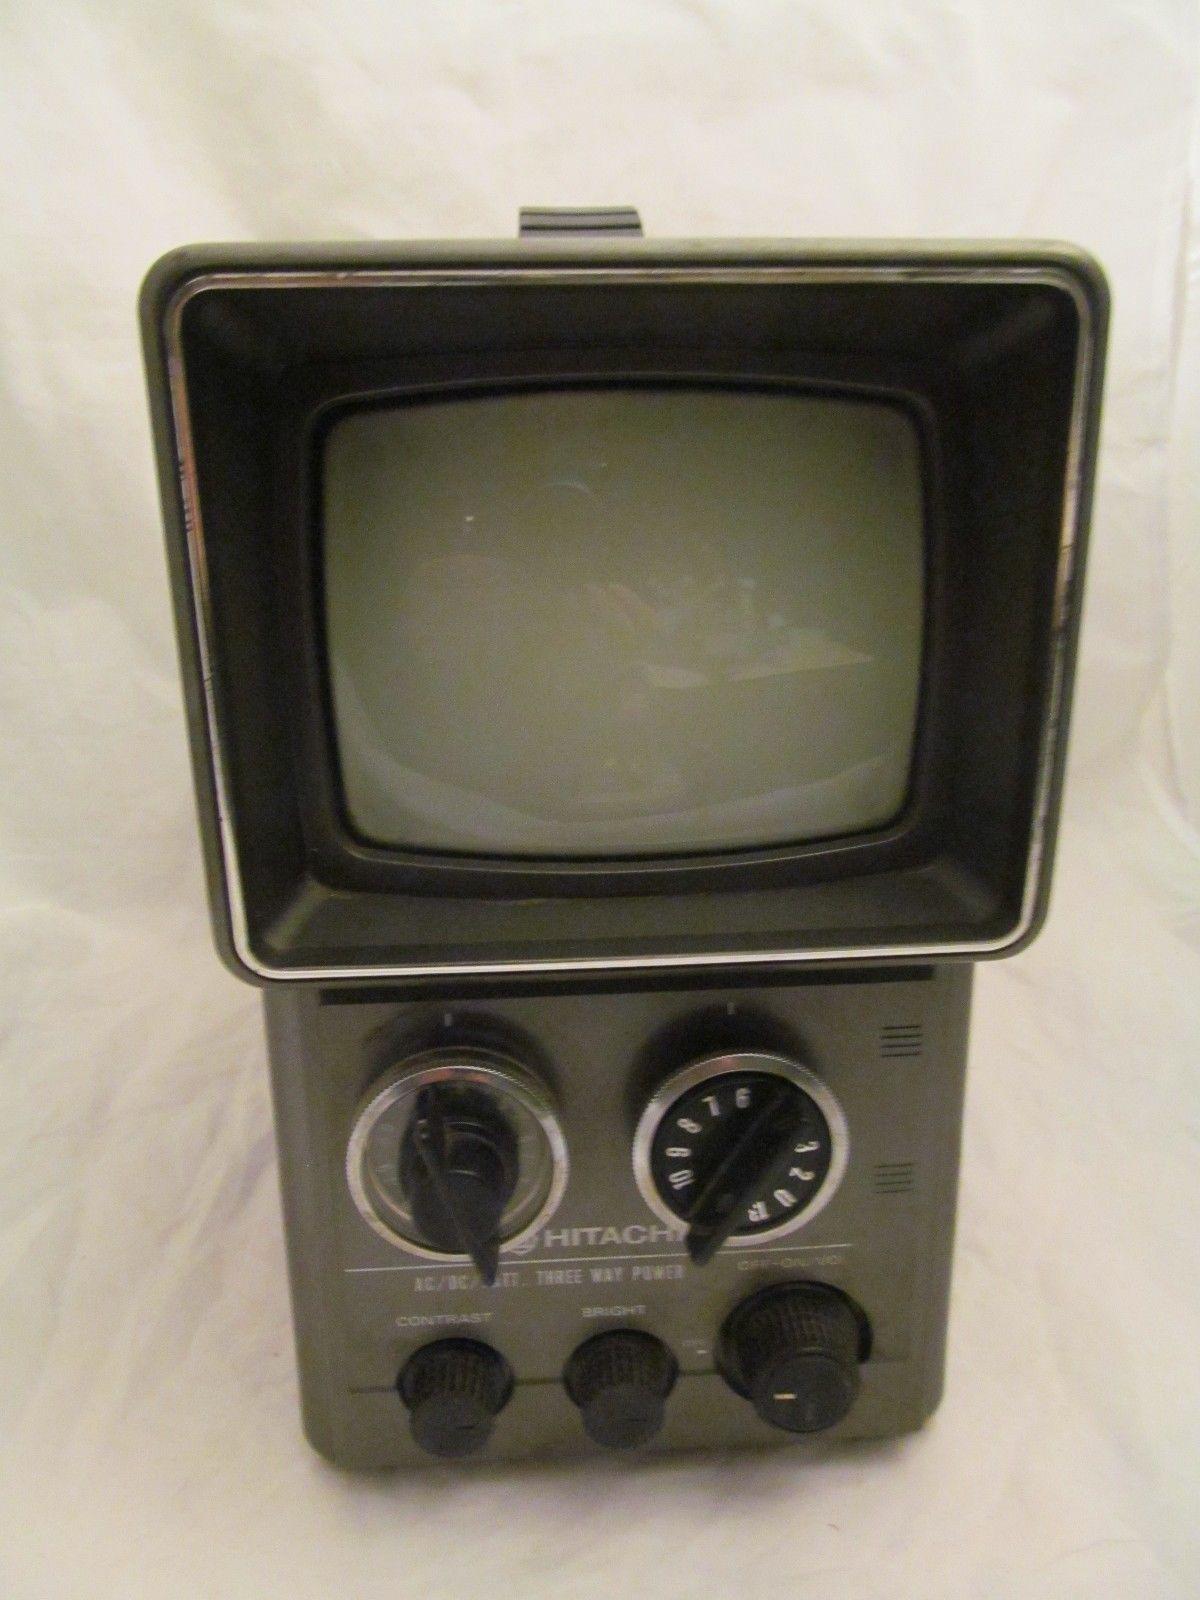 Vintage portable TV Hitachi K1100 Batteries wall plug